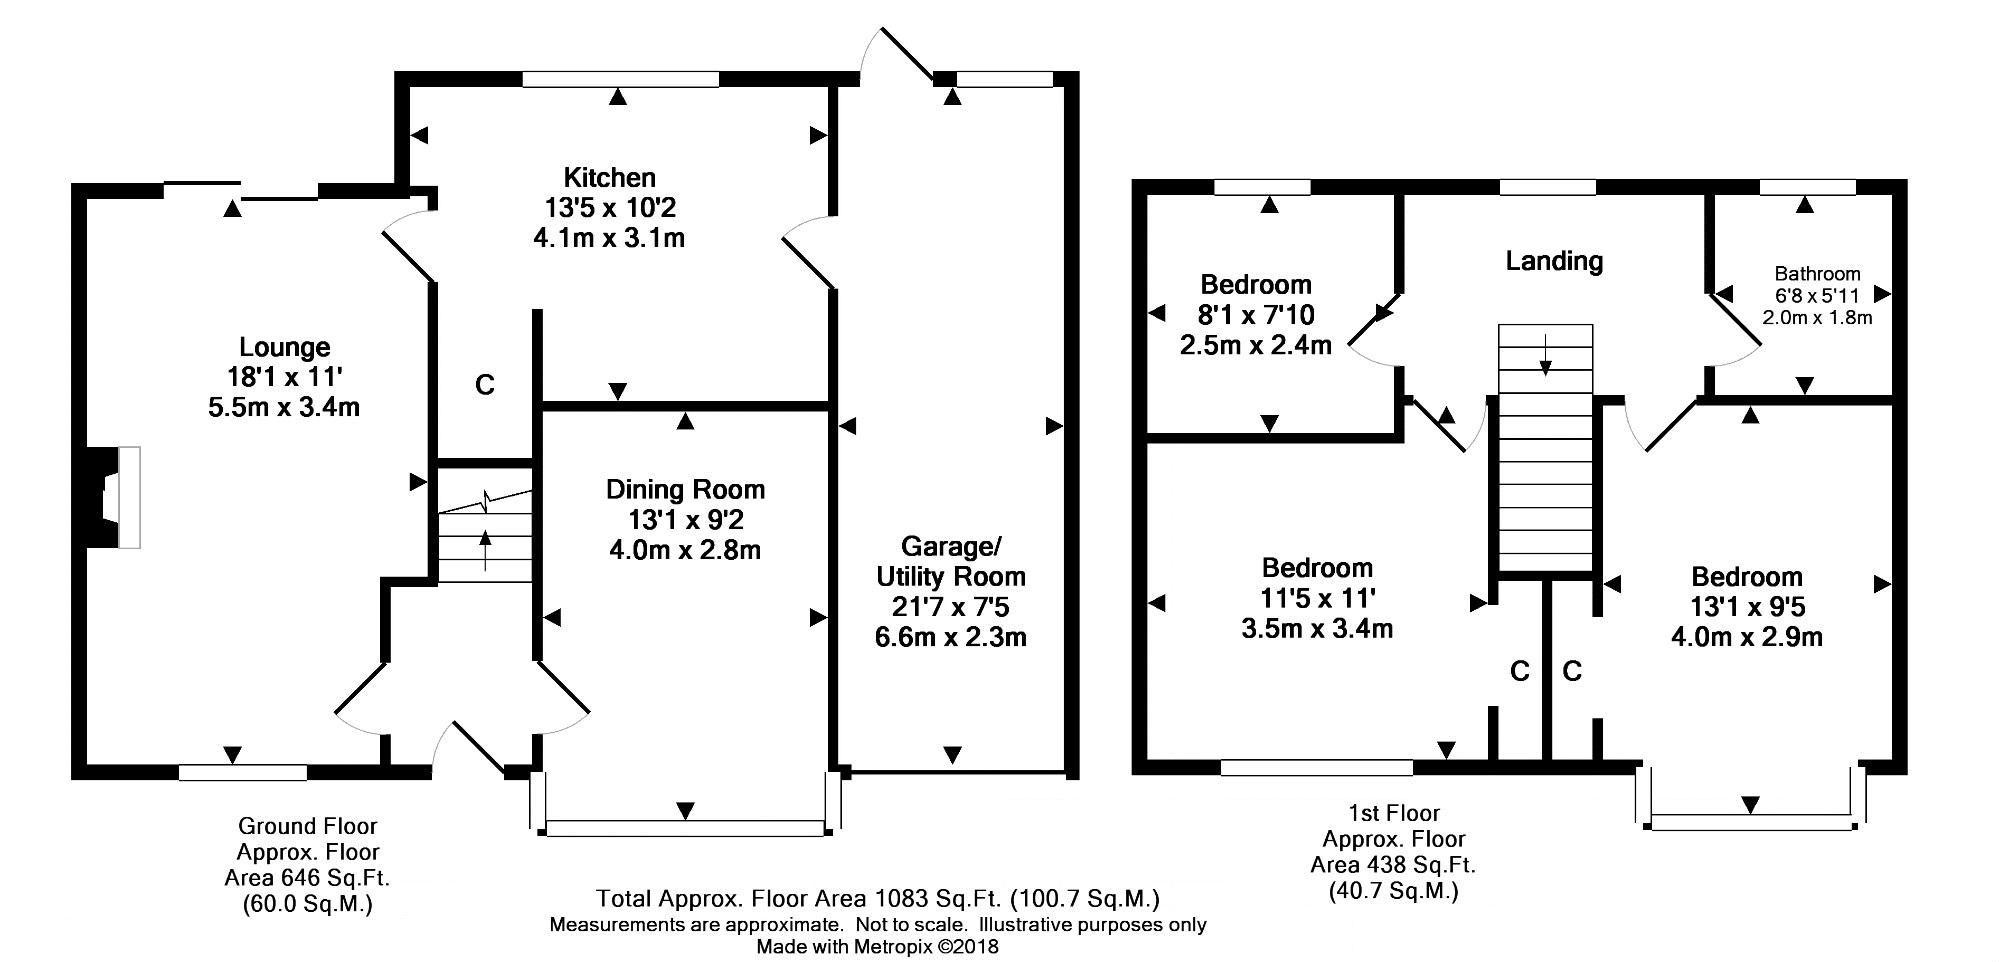 Manor Green Road, Epsom KT19, 3 bedroom detached house for